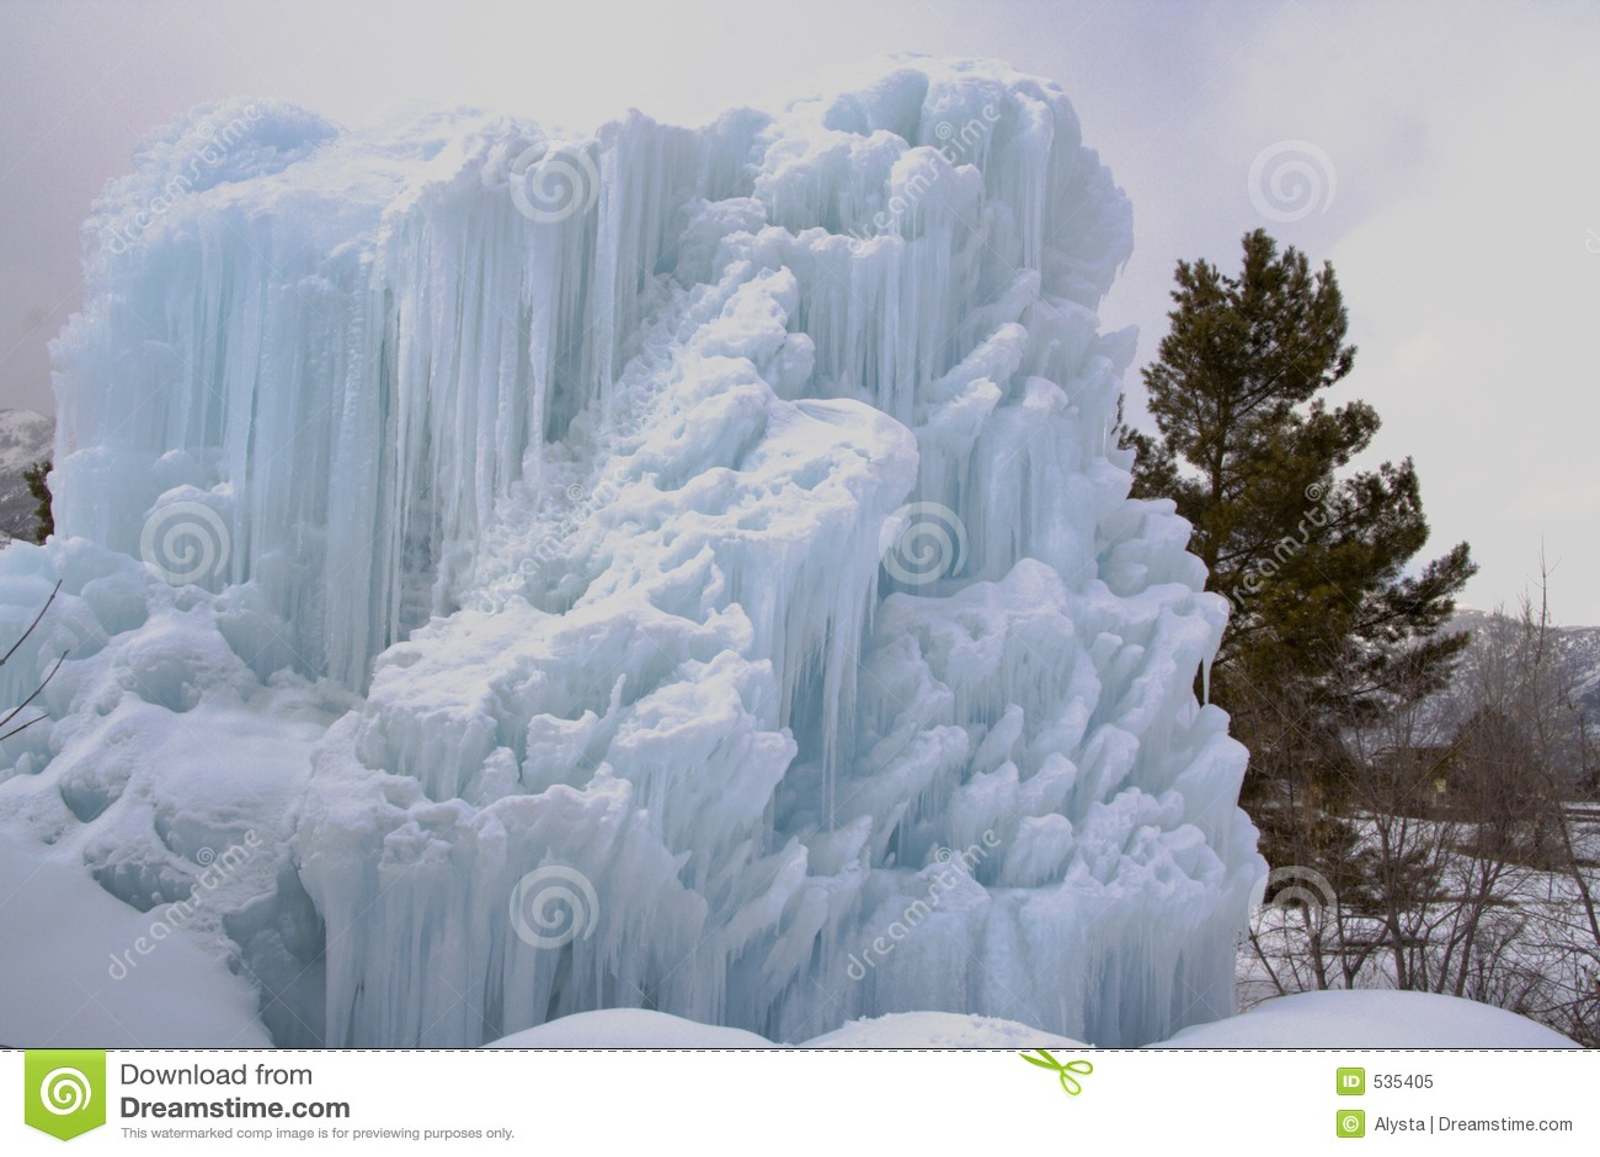 Download 微型的冰川 库存图片. 图片 包括有 结构树, 冰山, 喷泉, 冰柱, 冰川, 冻结, 蓝色, 冬天, 冰冷 - 535405